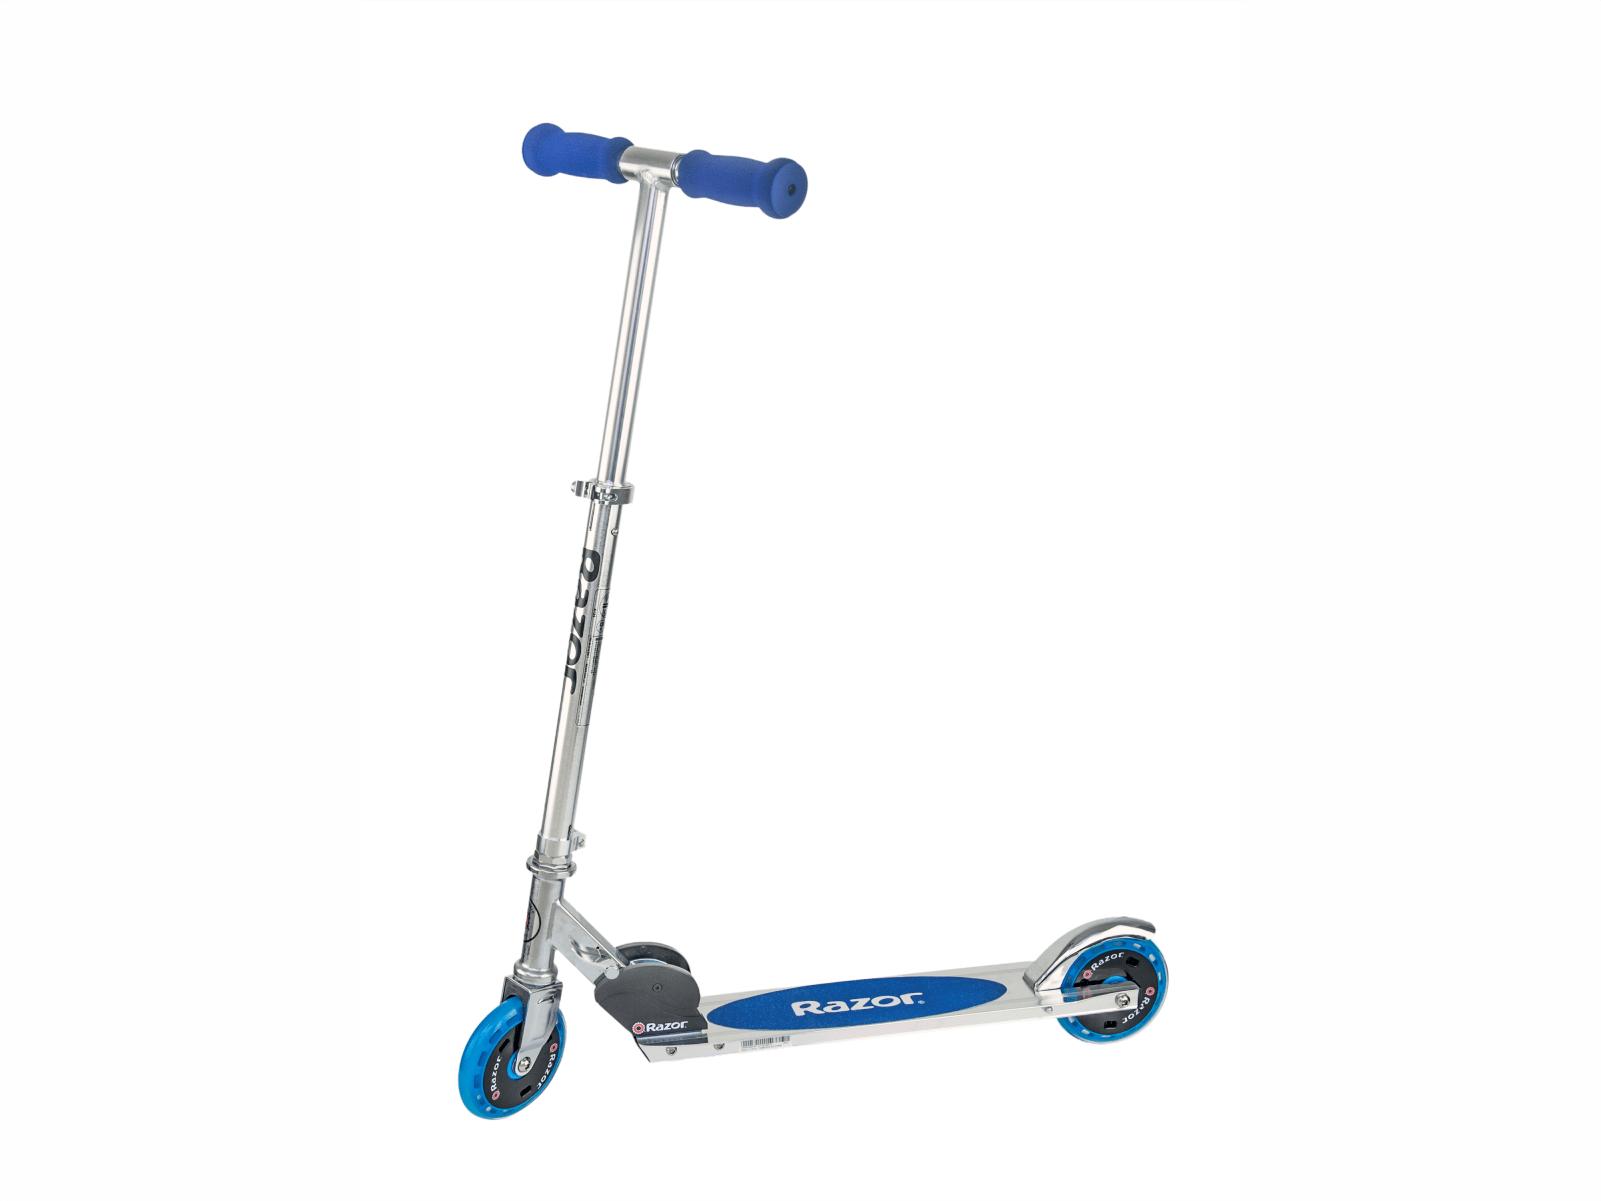 RAZOR Scooter A125 GS.